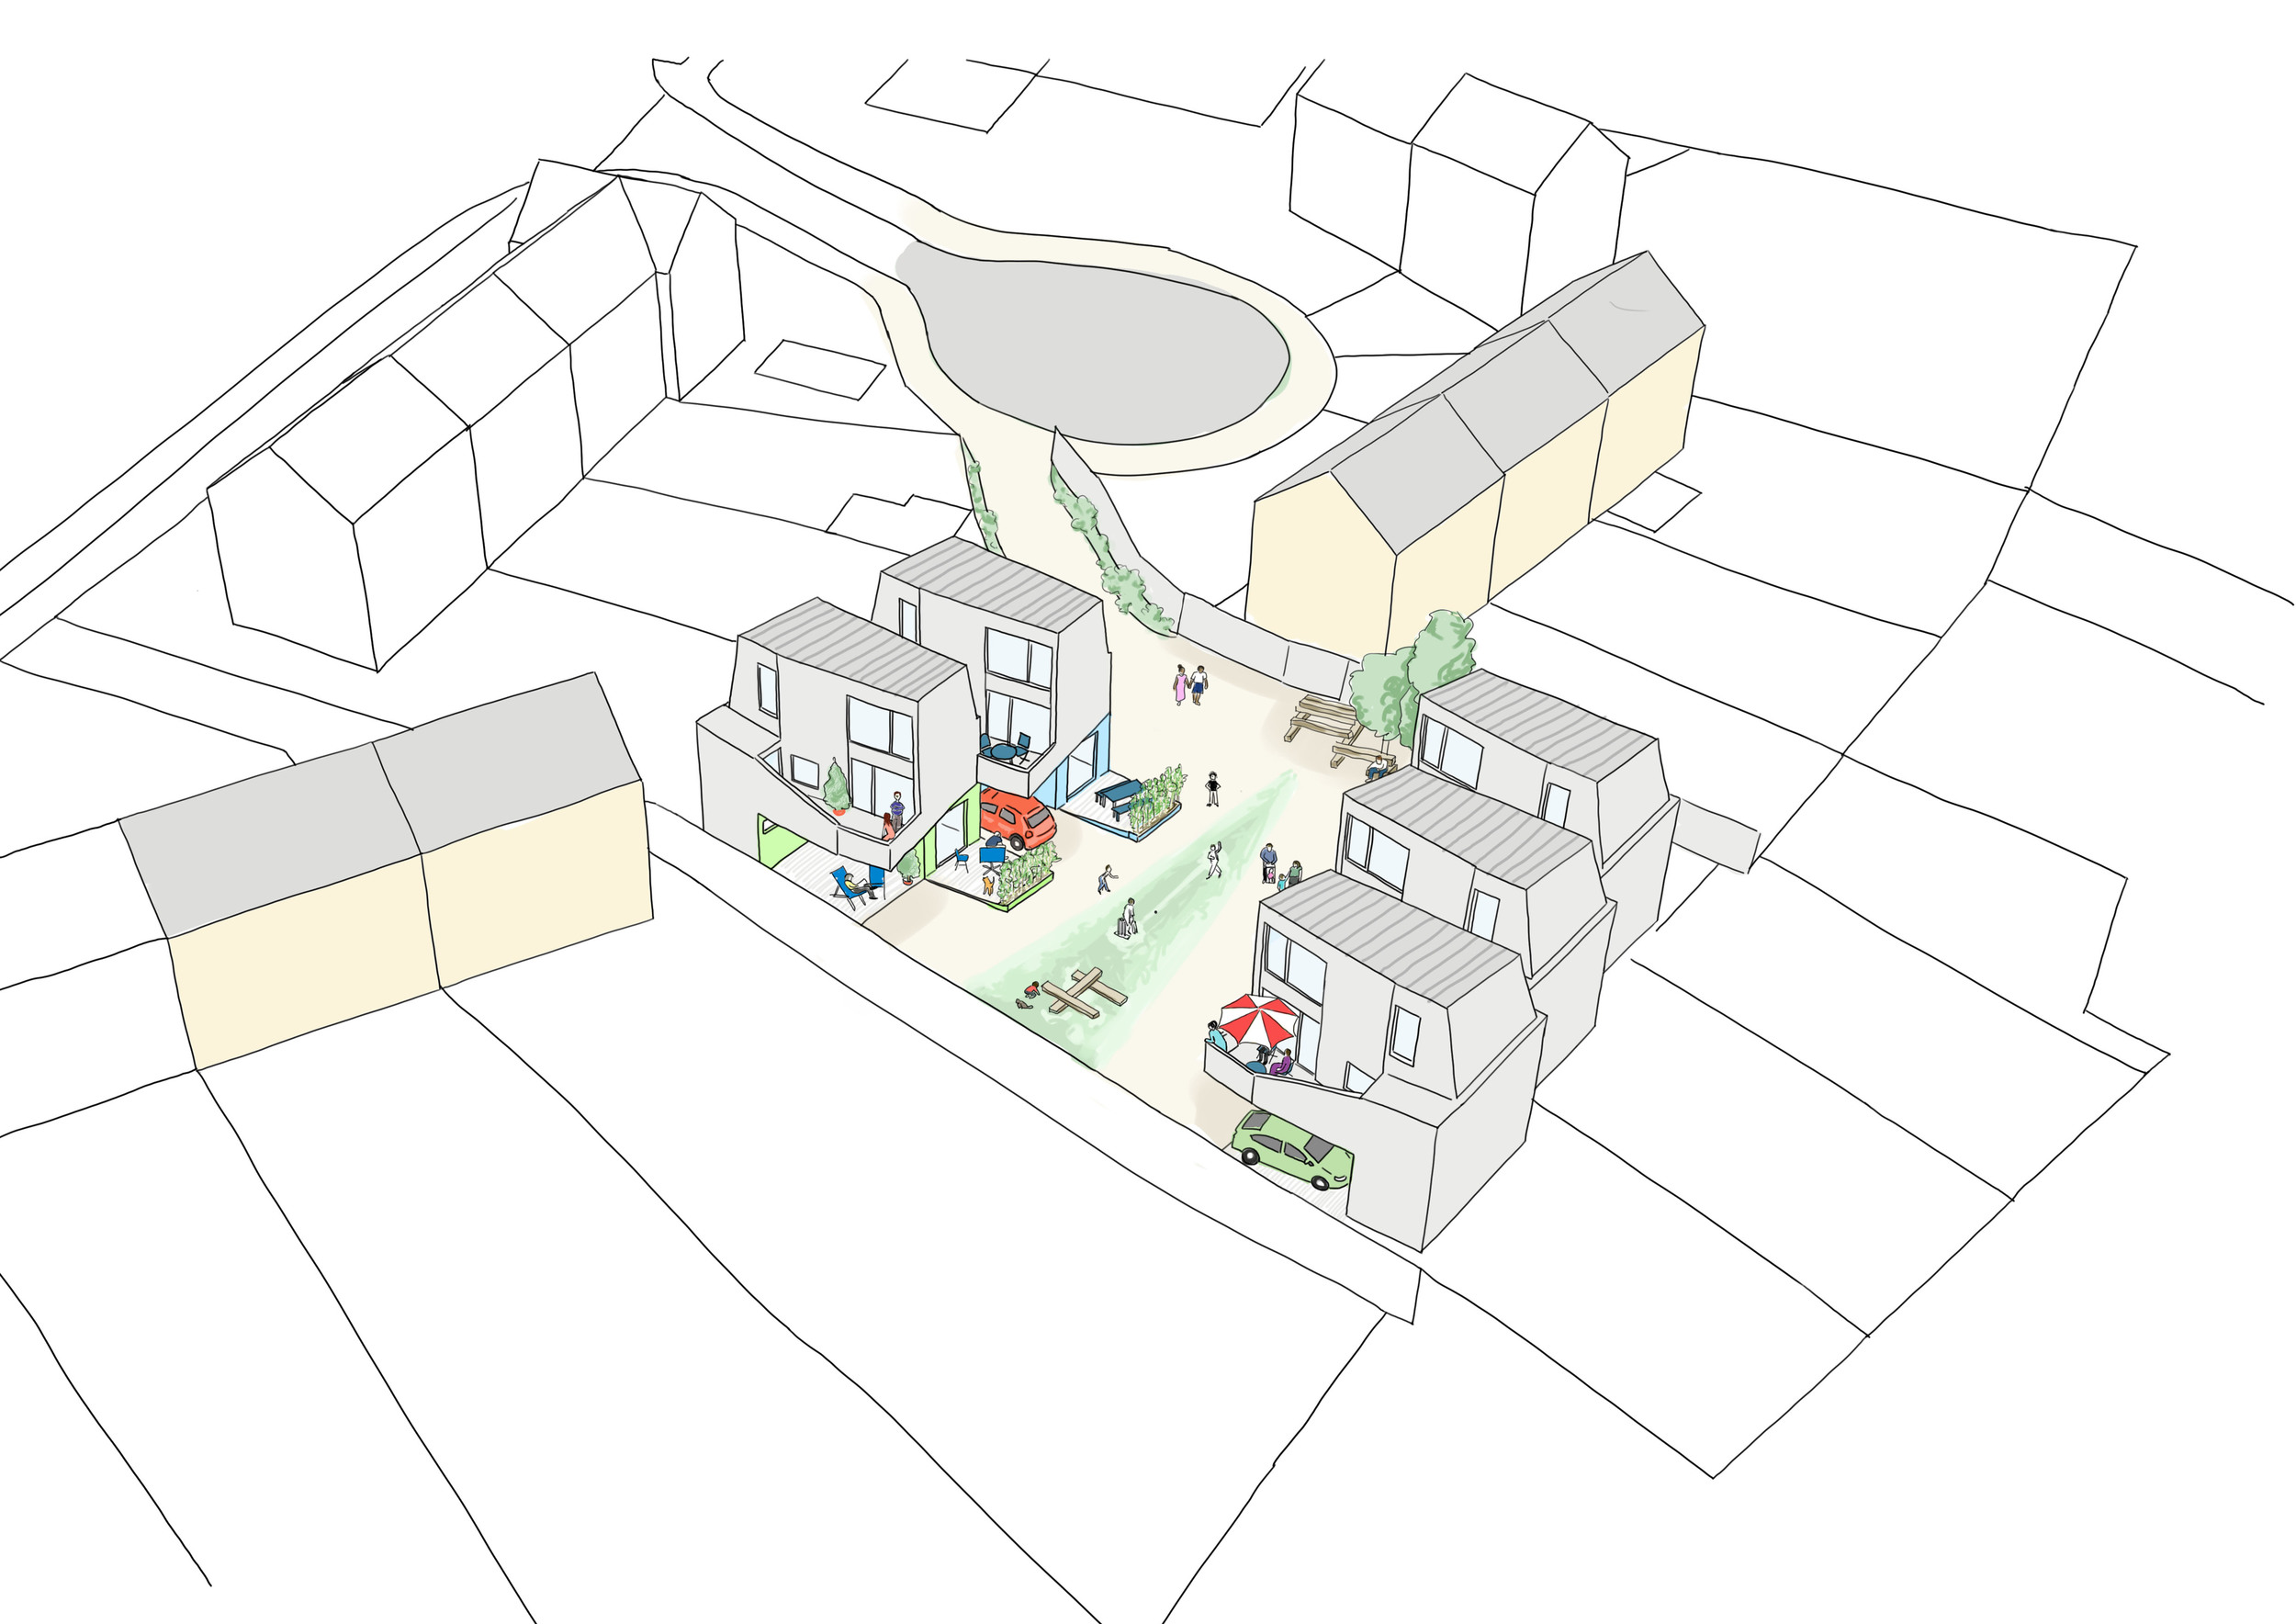 00_Brighton Housing Competition_02.jpg